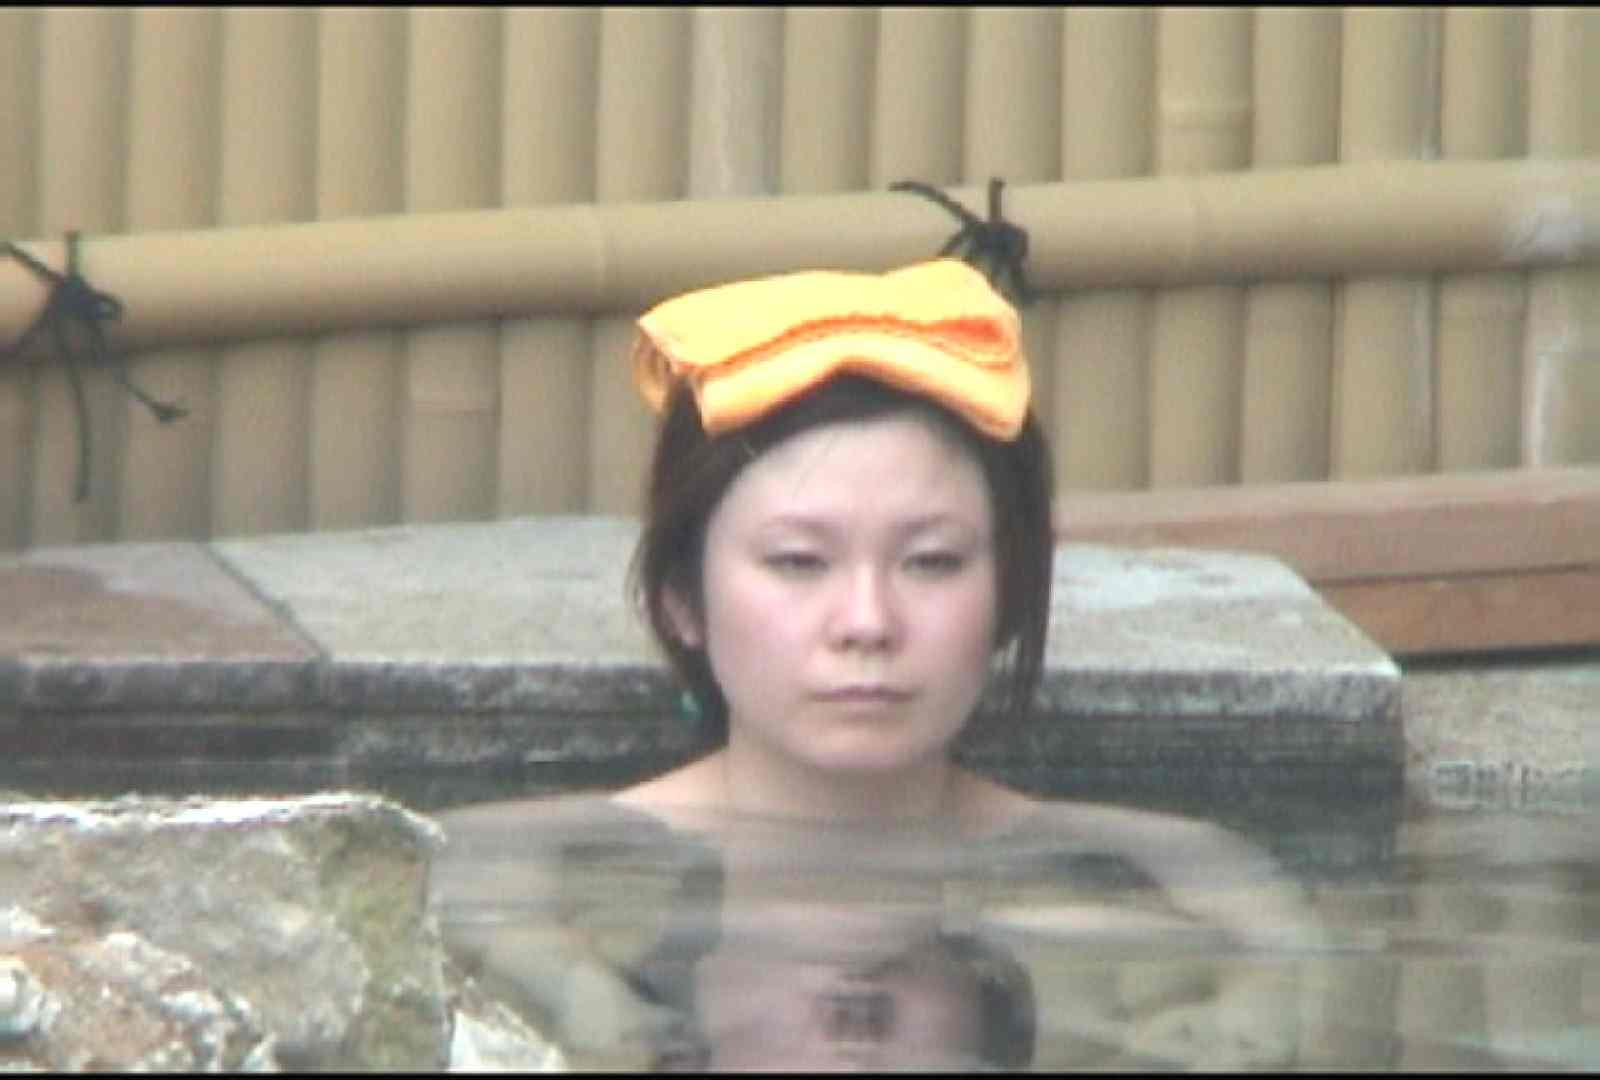 Aquaな露天風呂Vol.177 綺麗なOLたち アダルト動画キャプチャ 112枚 110